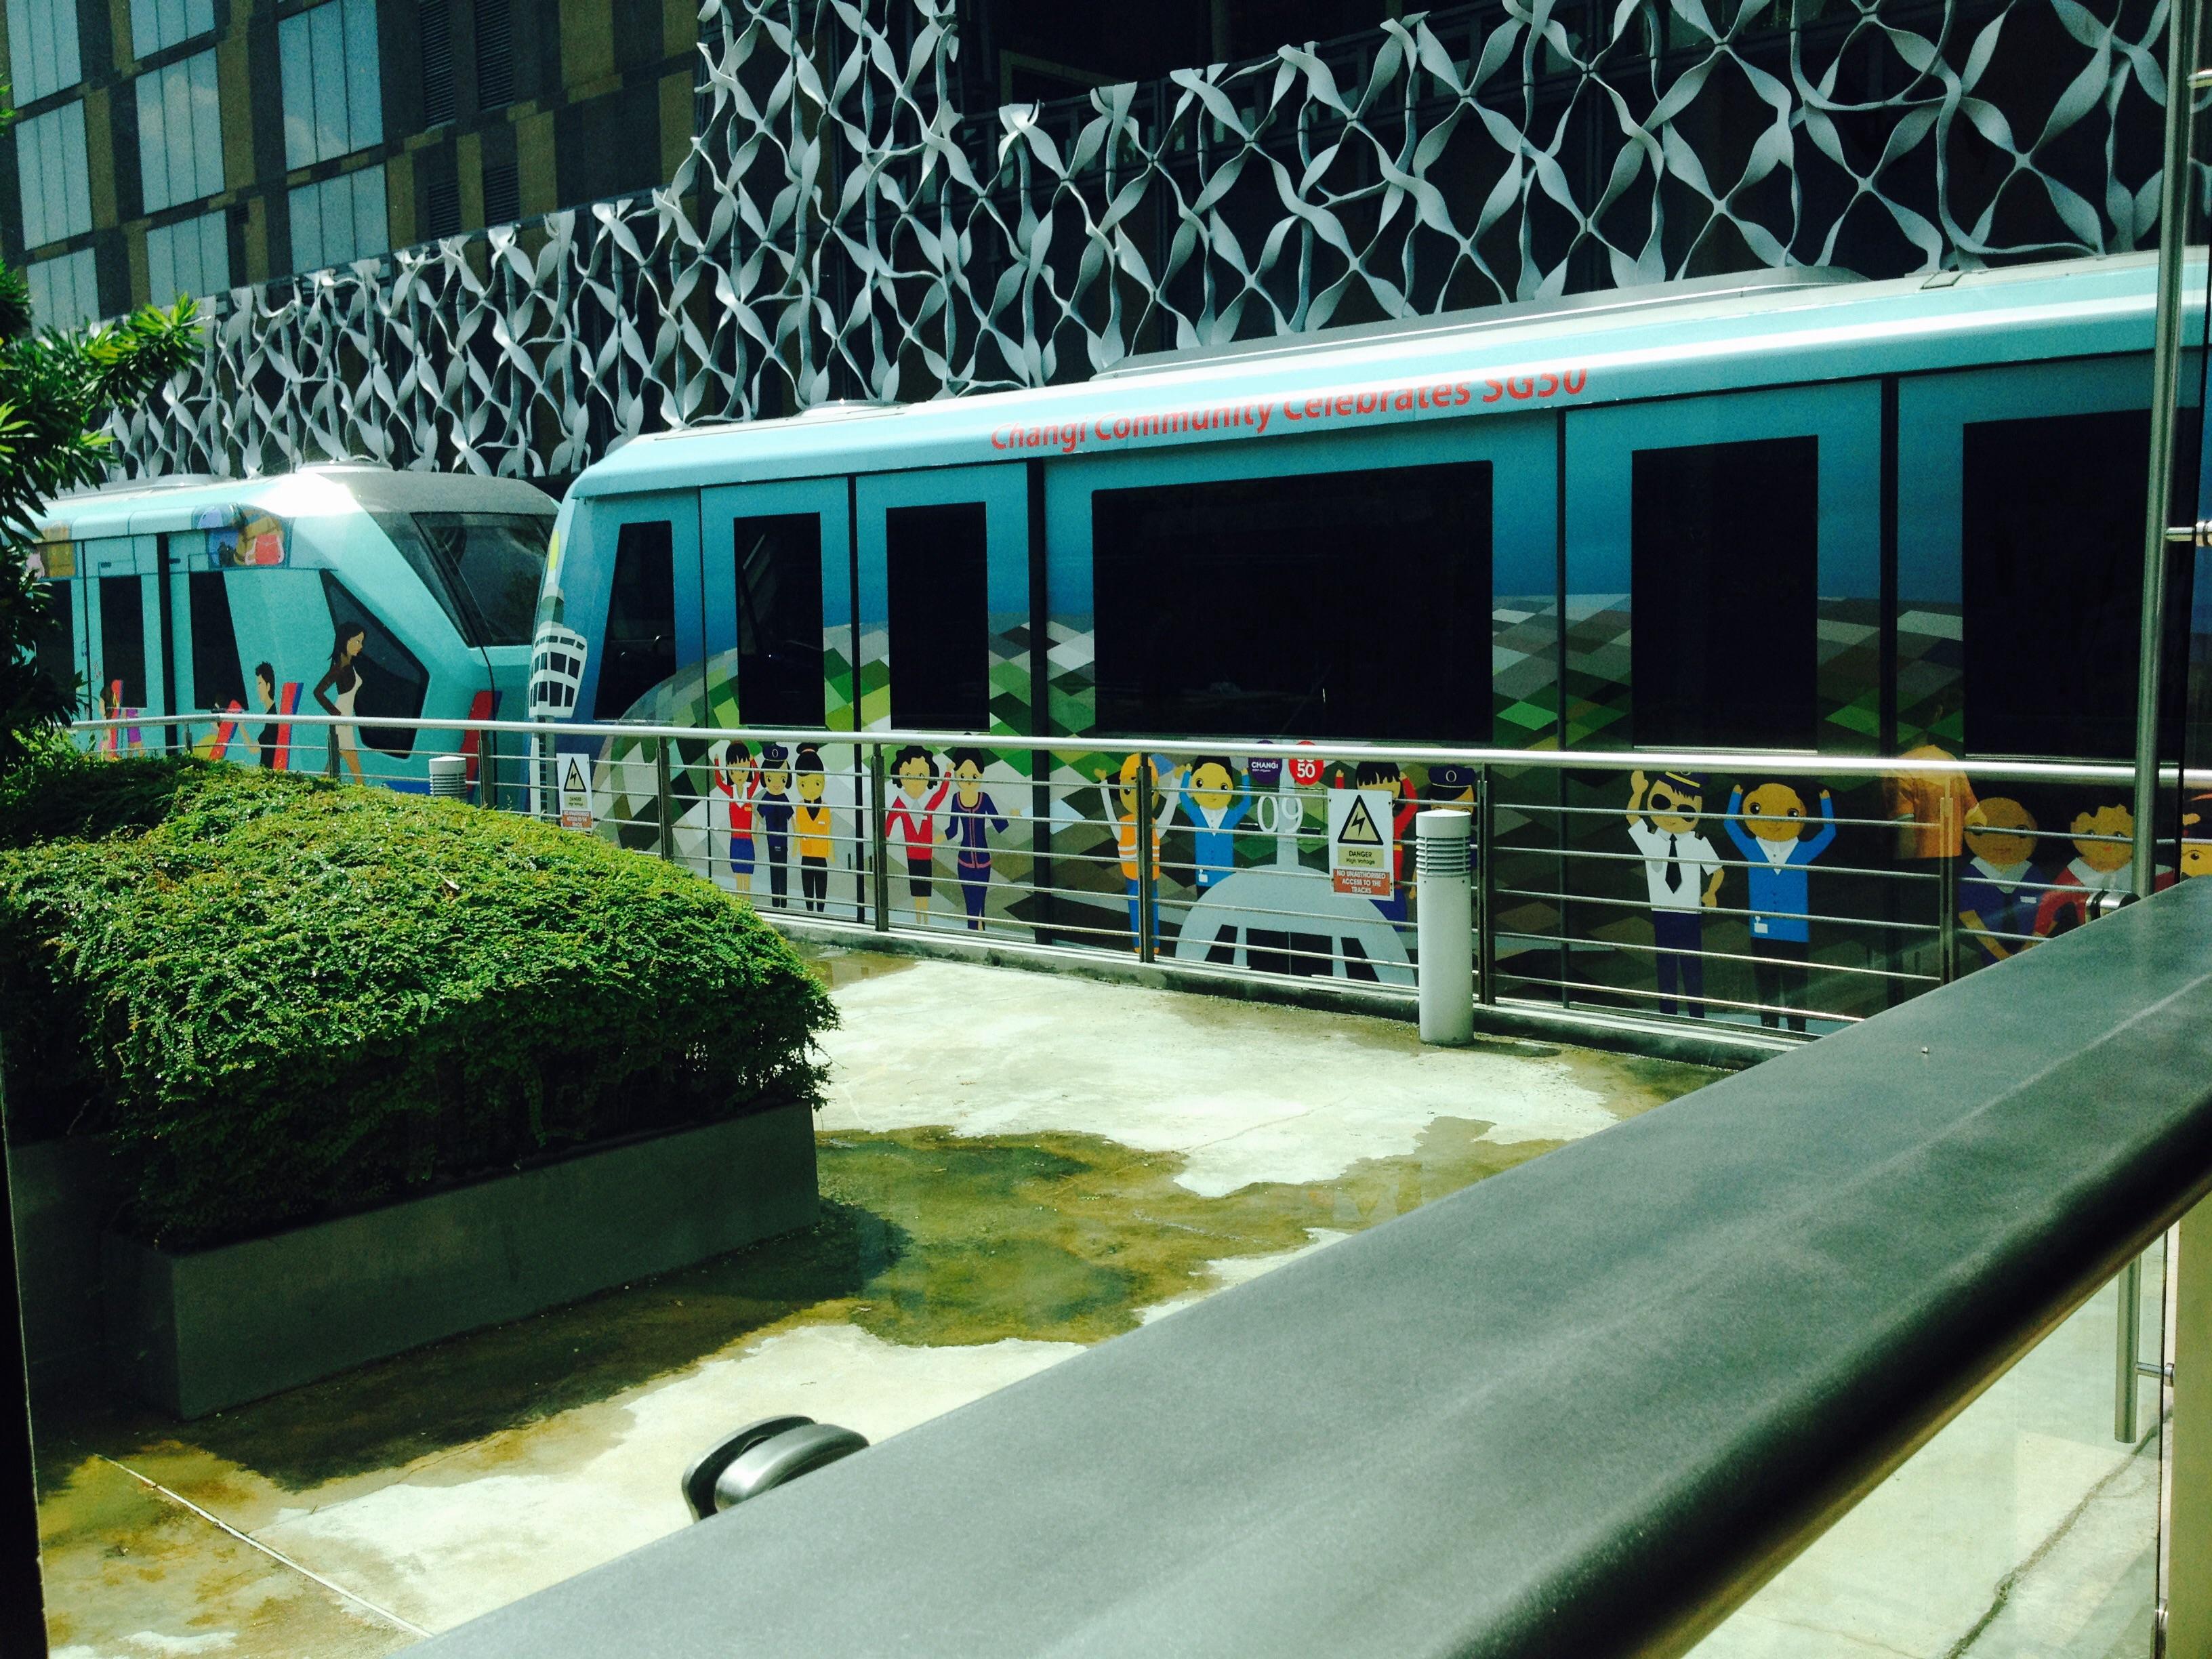 [Image: Changi_Airport_Skytrain_Exterior.jpg]